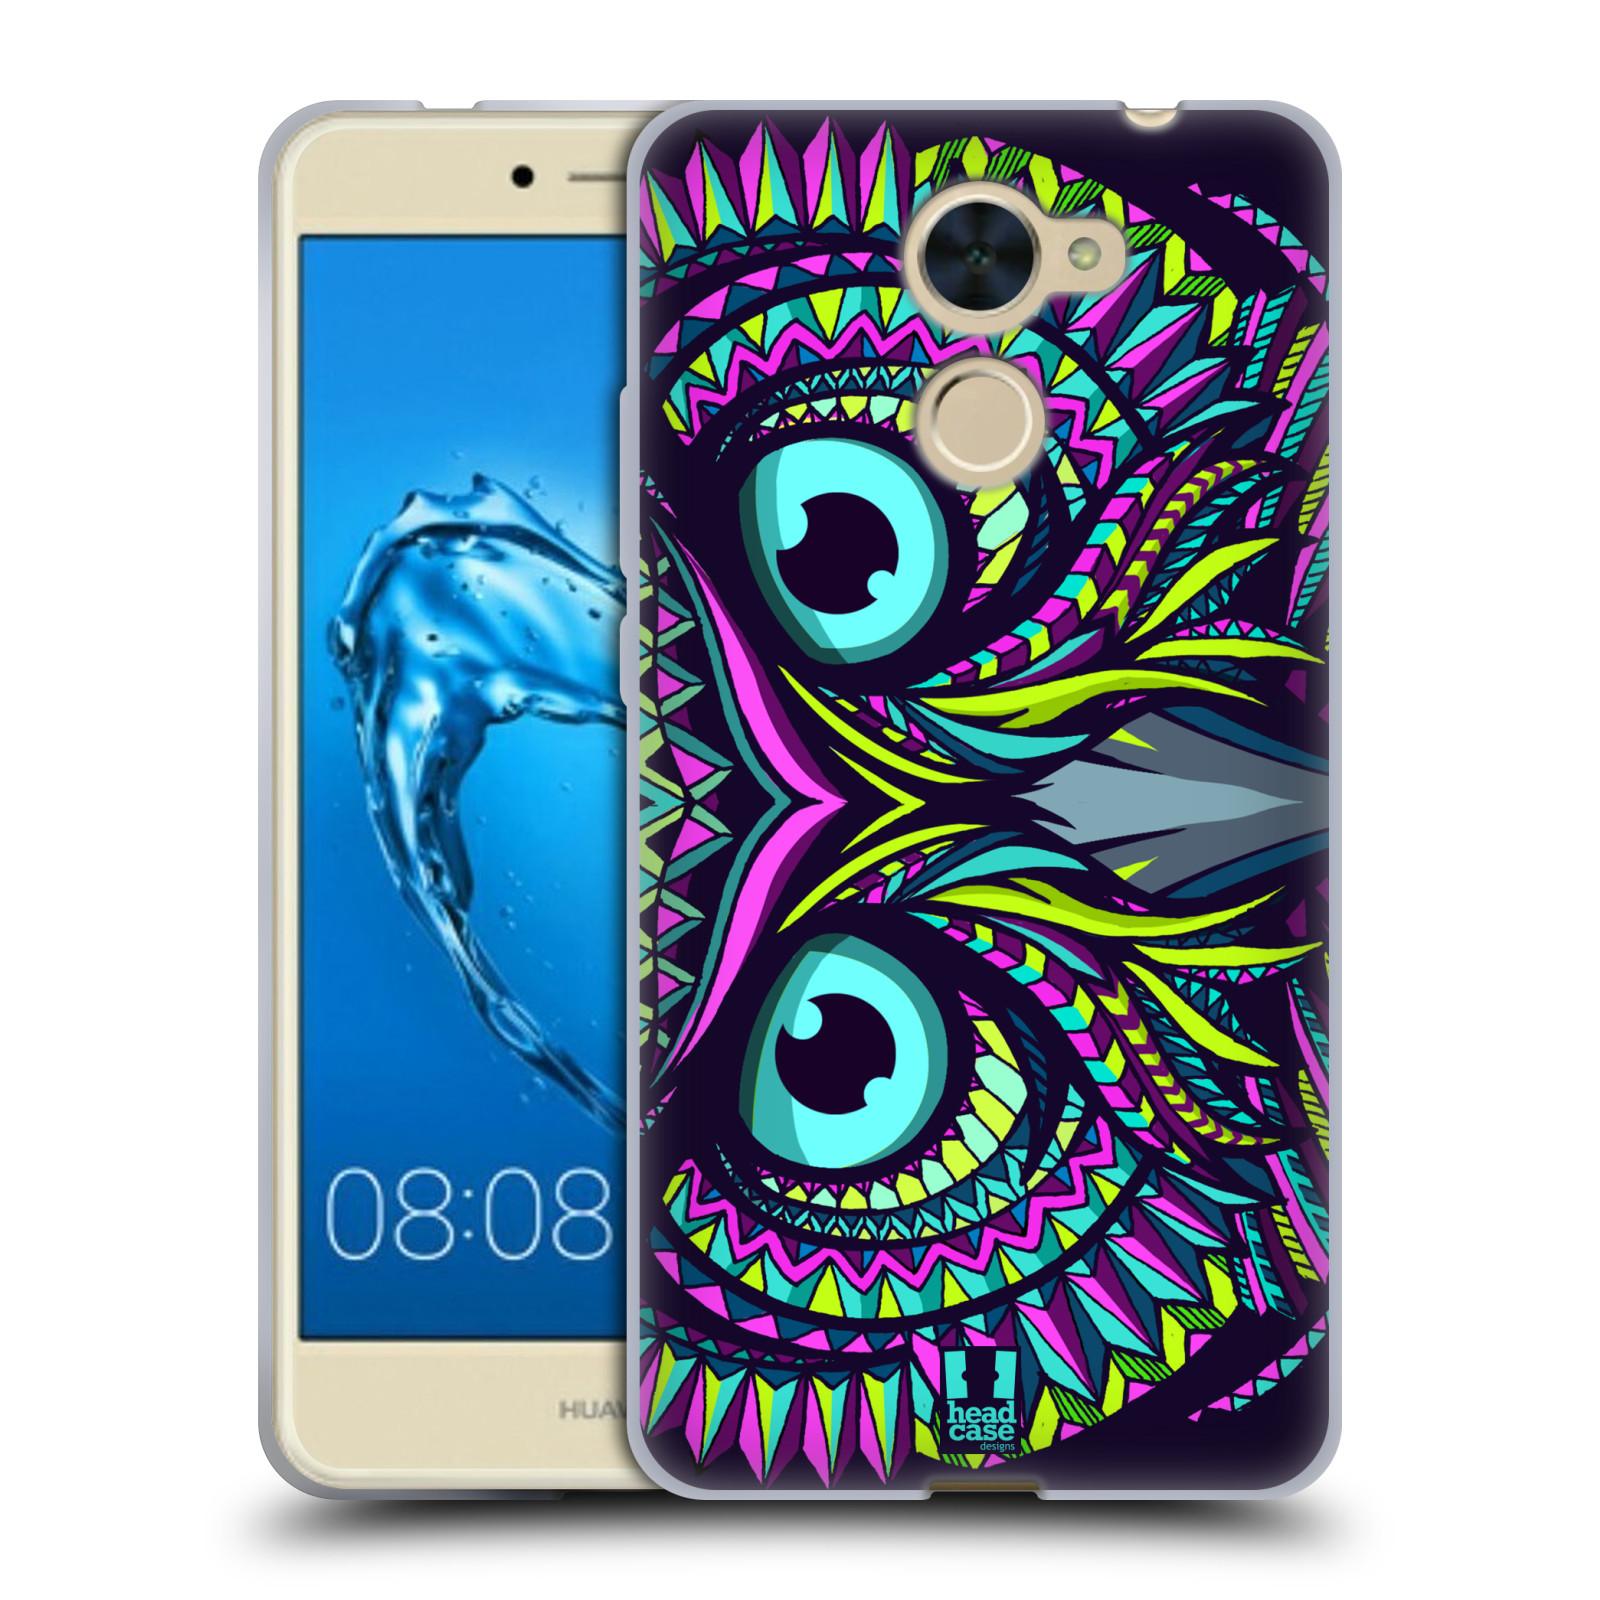 Silikonové pouzdro na mobil Huawei Y7 - Head Case - AZTEC SOVA